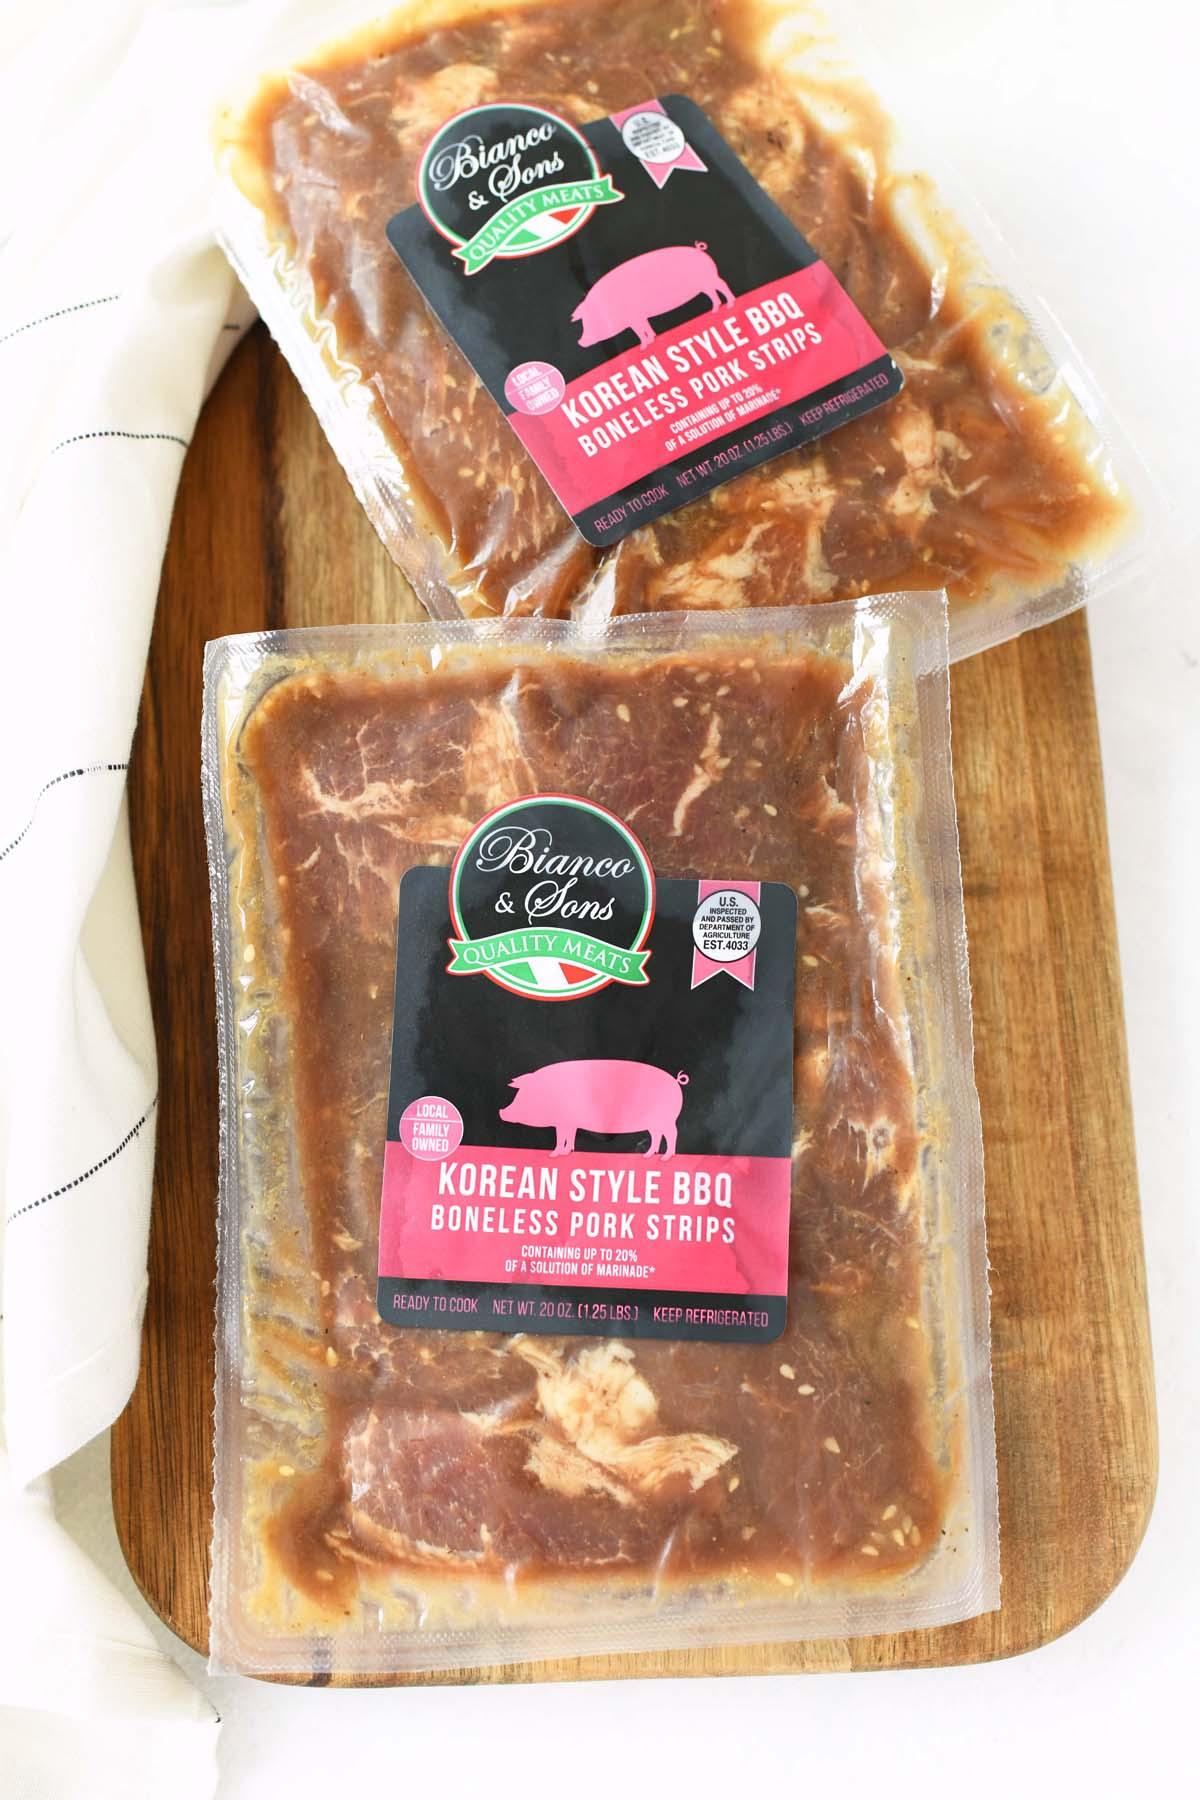 Bianco & Sons packaged of Bianco Korean Style Boneless BBQ Pork on a cutting board.